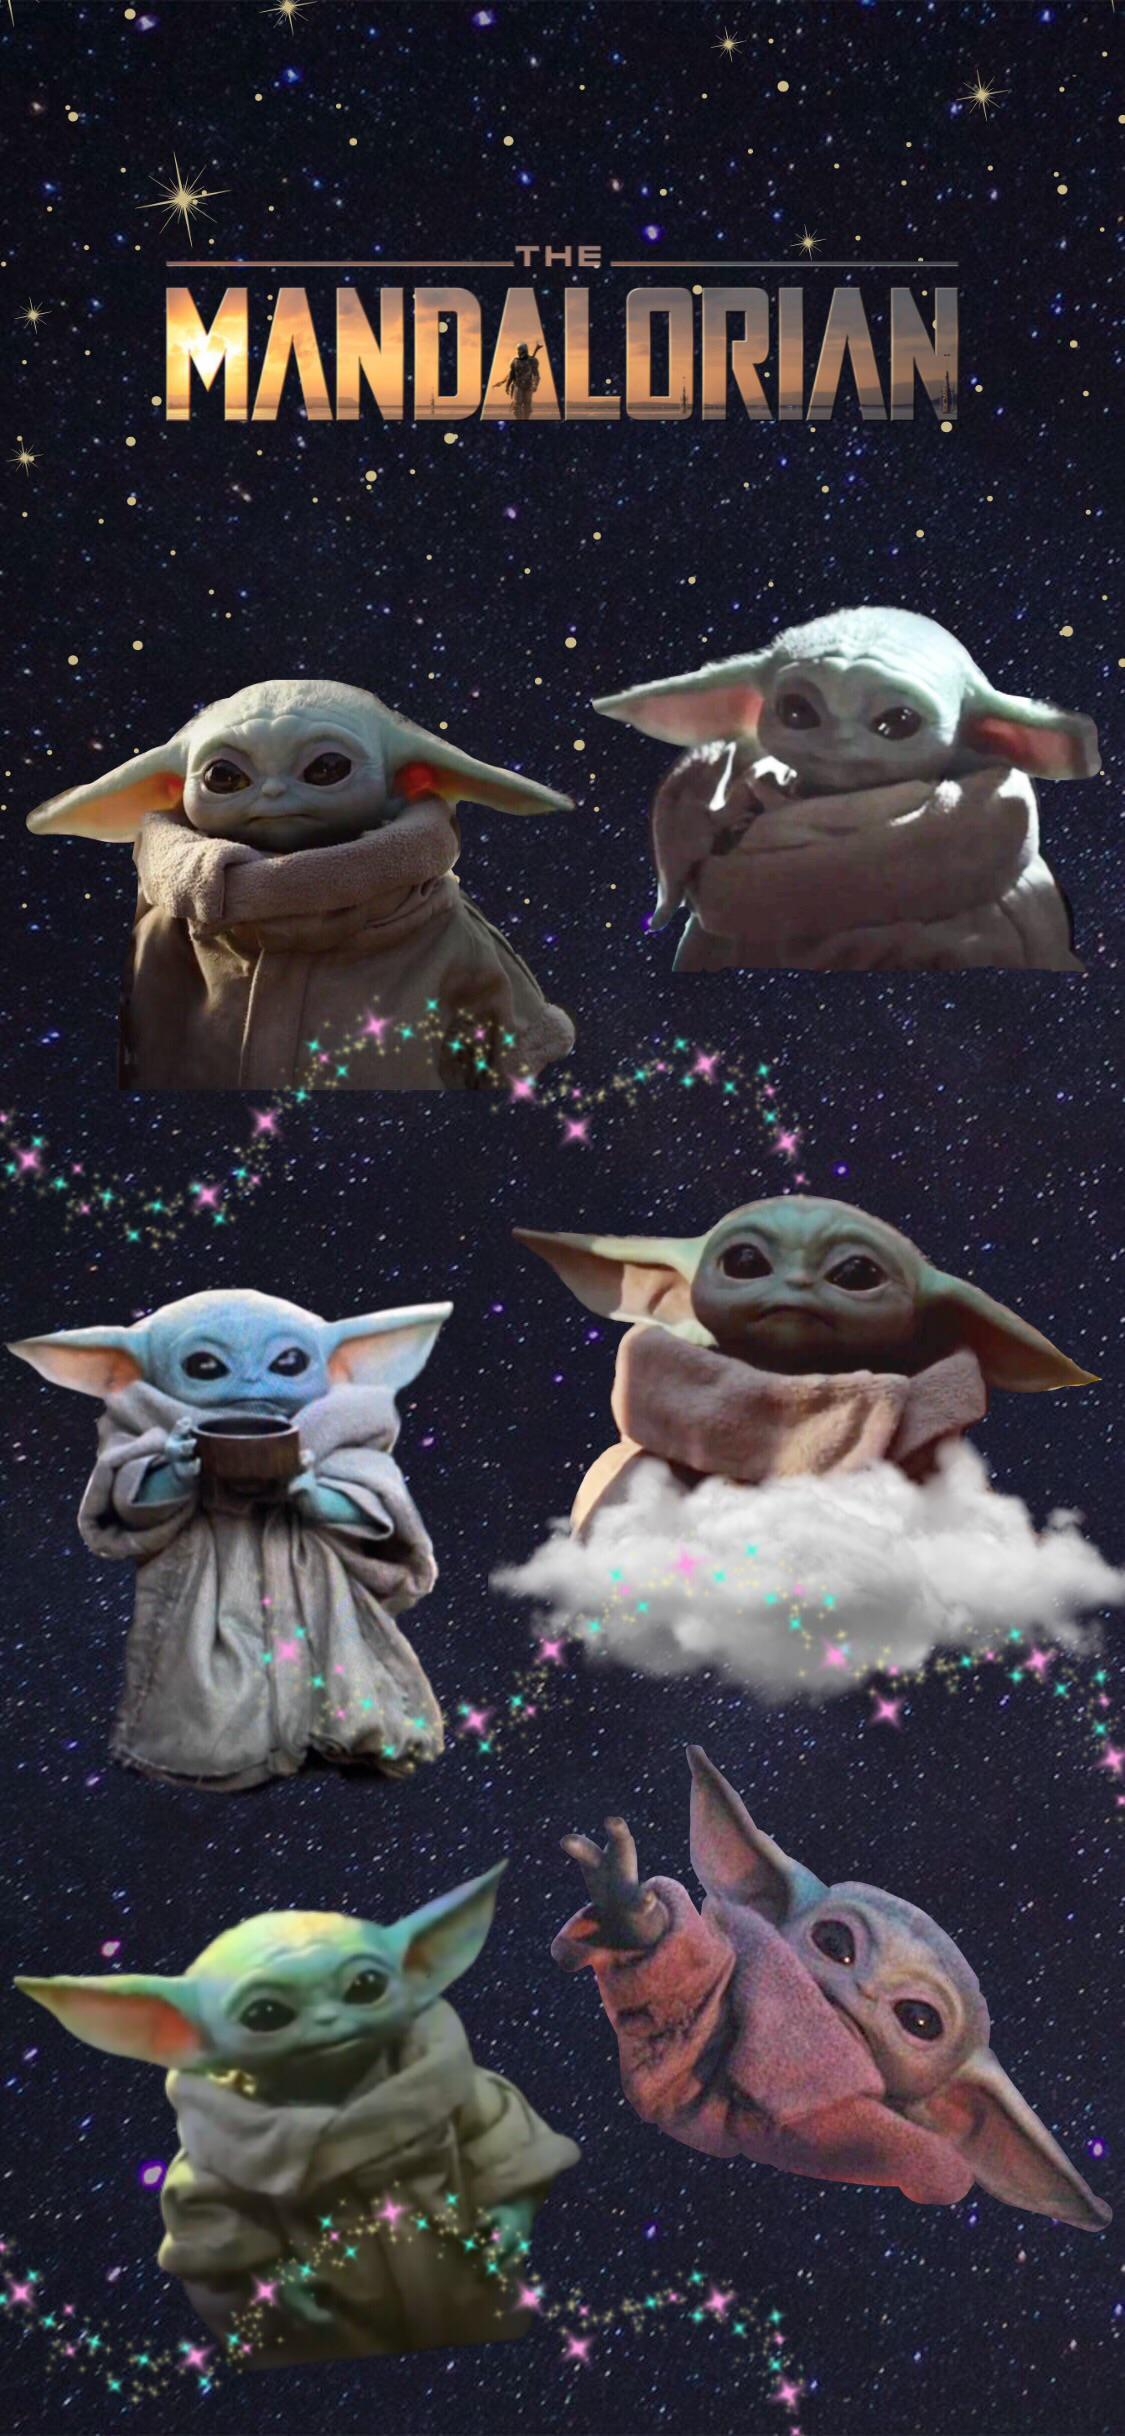 Baby Yoda Wallpaper Iphone X , HD Wallpaper & Backgrounds